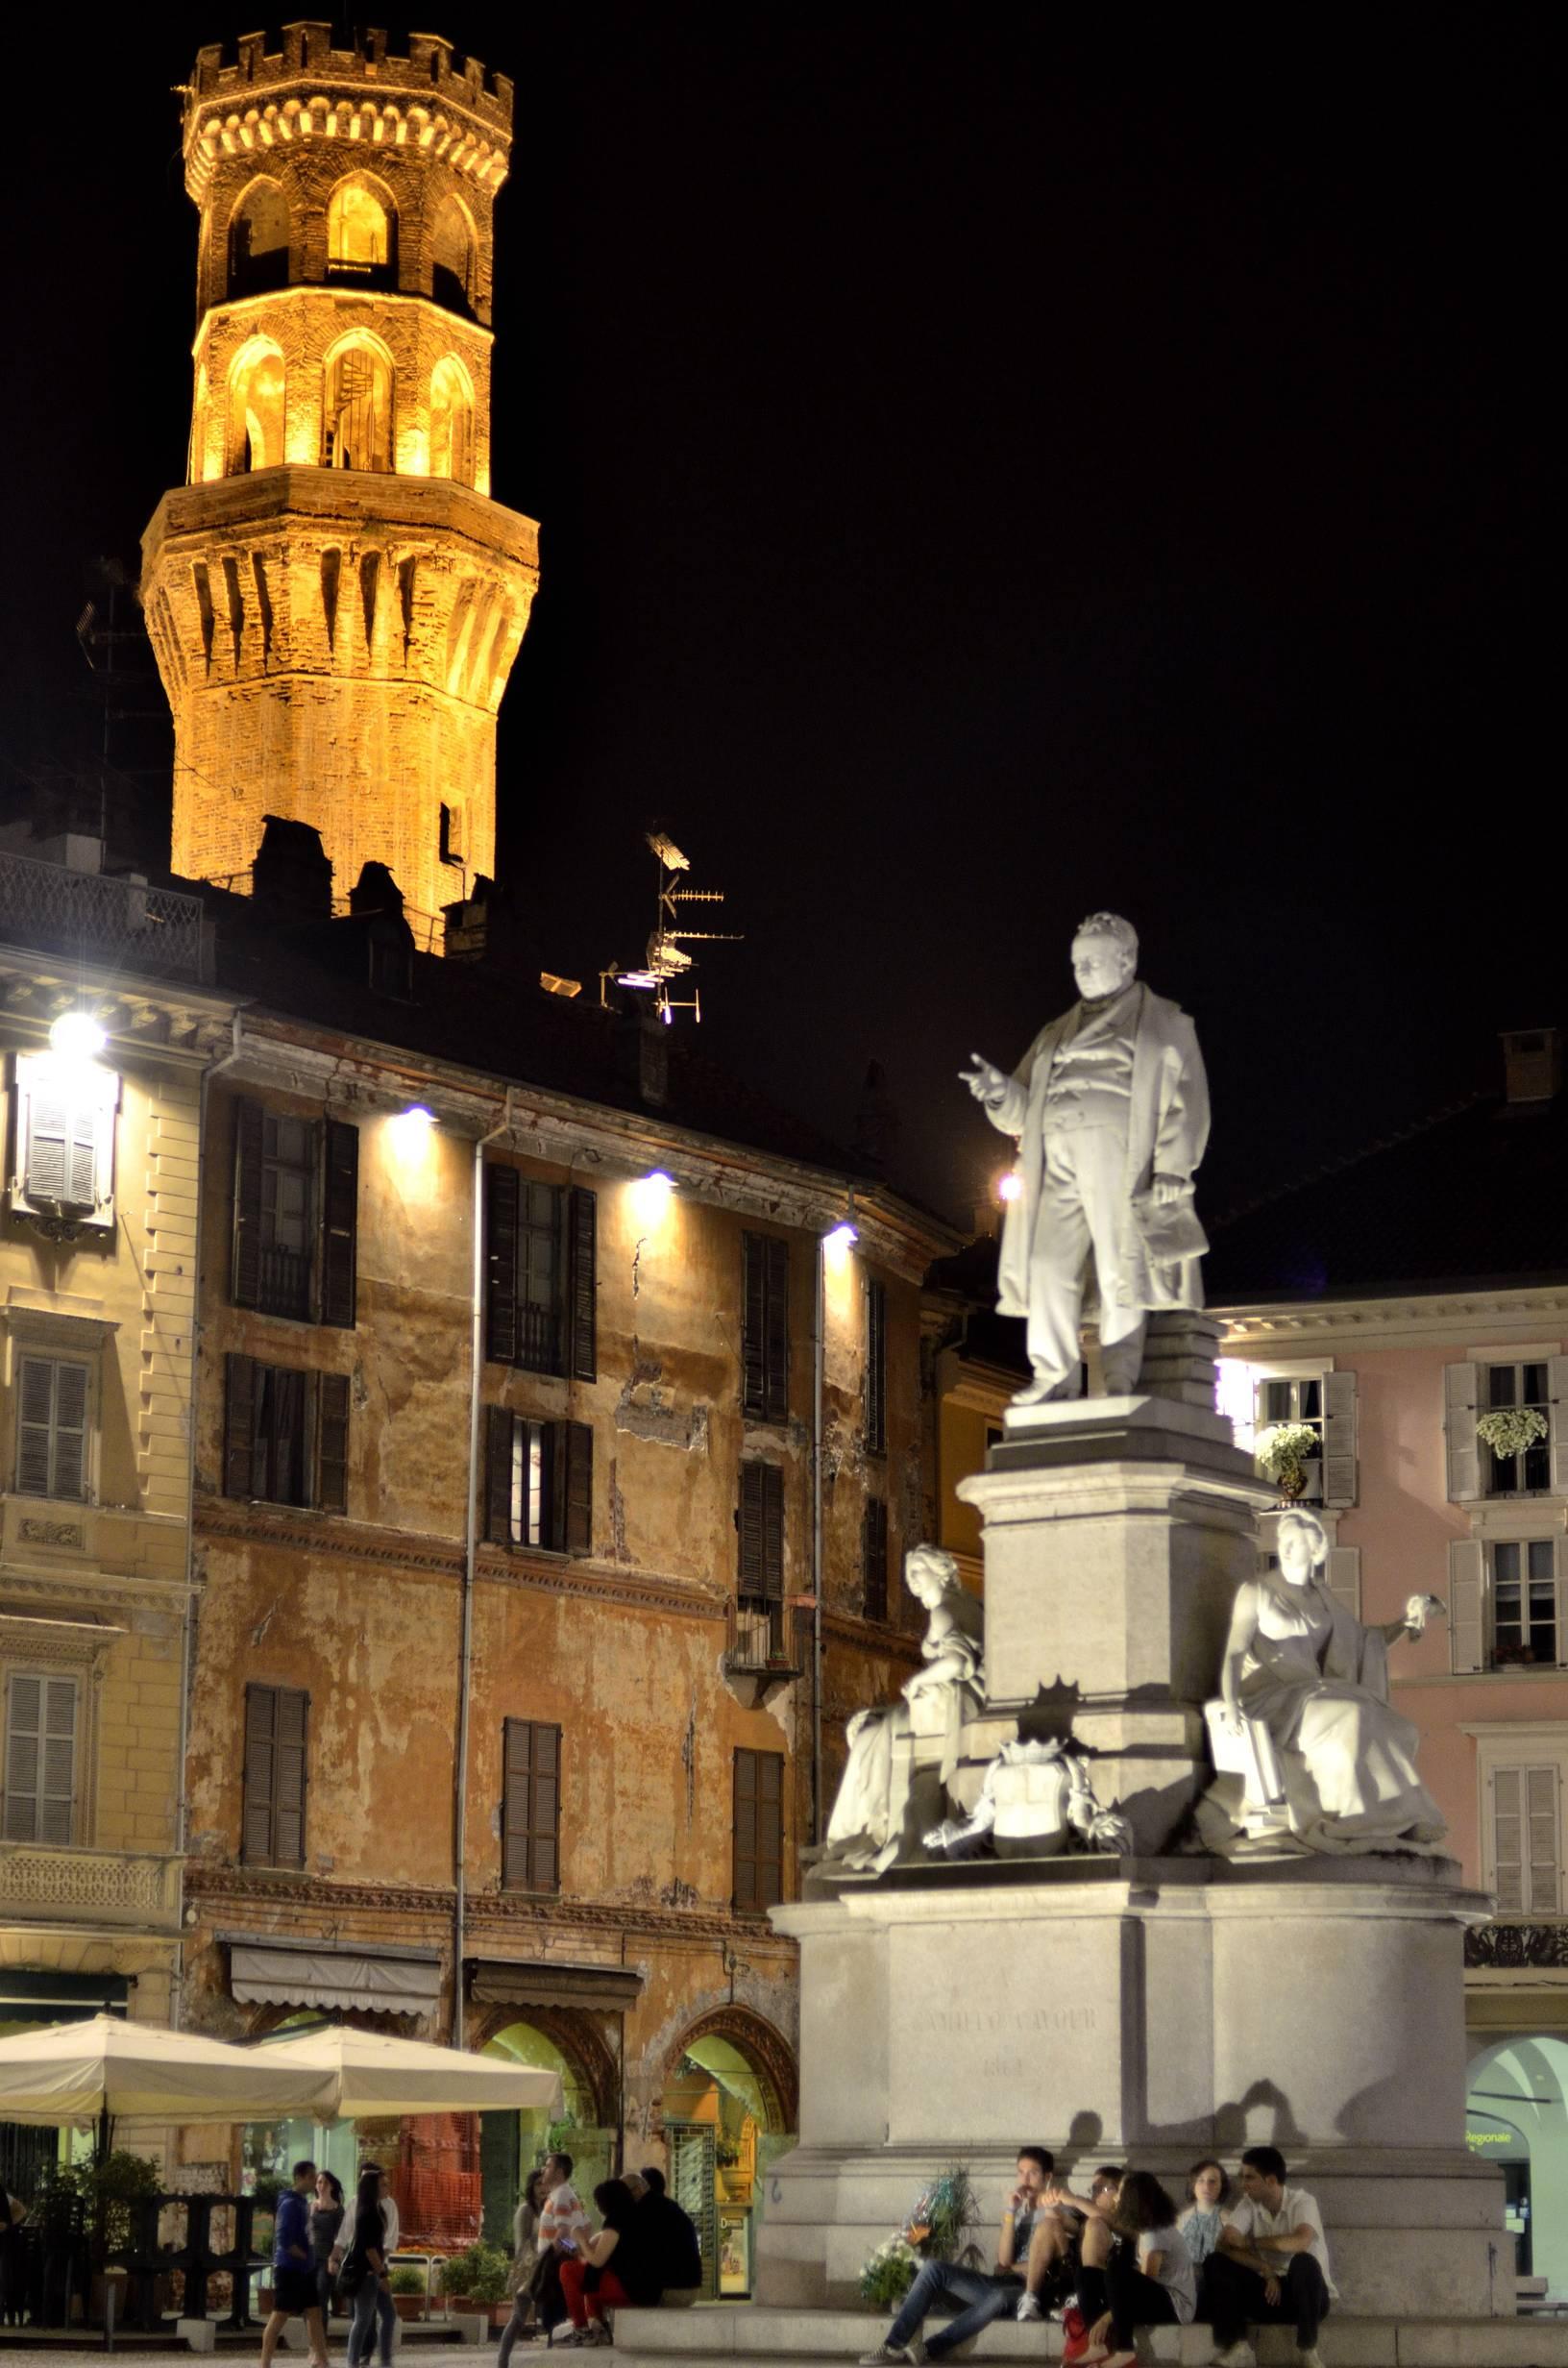 PiazzaCavour_Vercelli